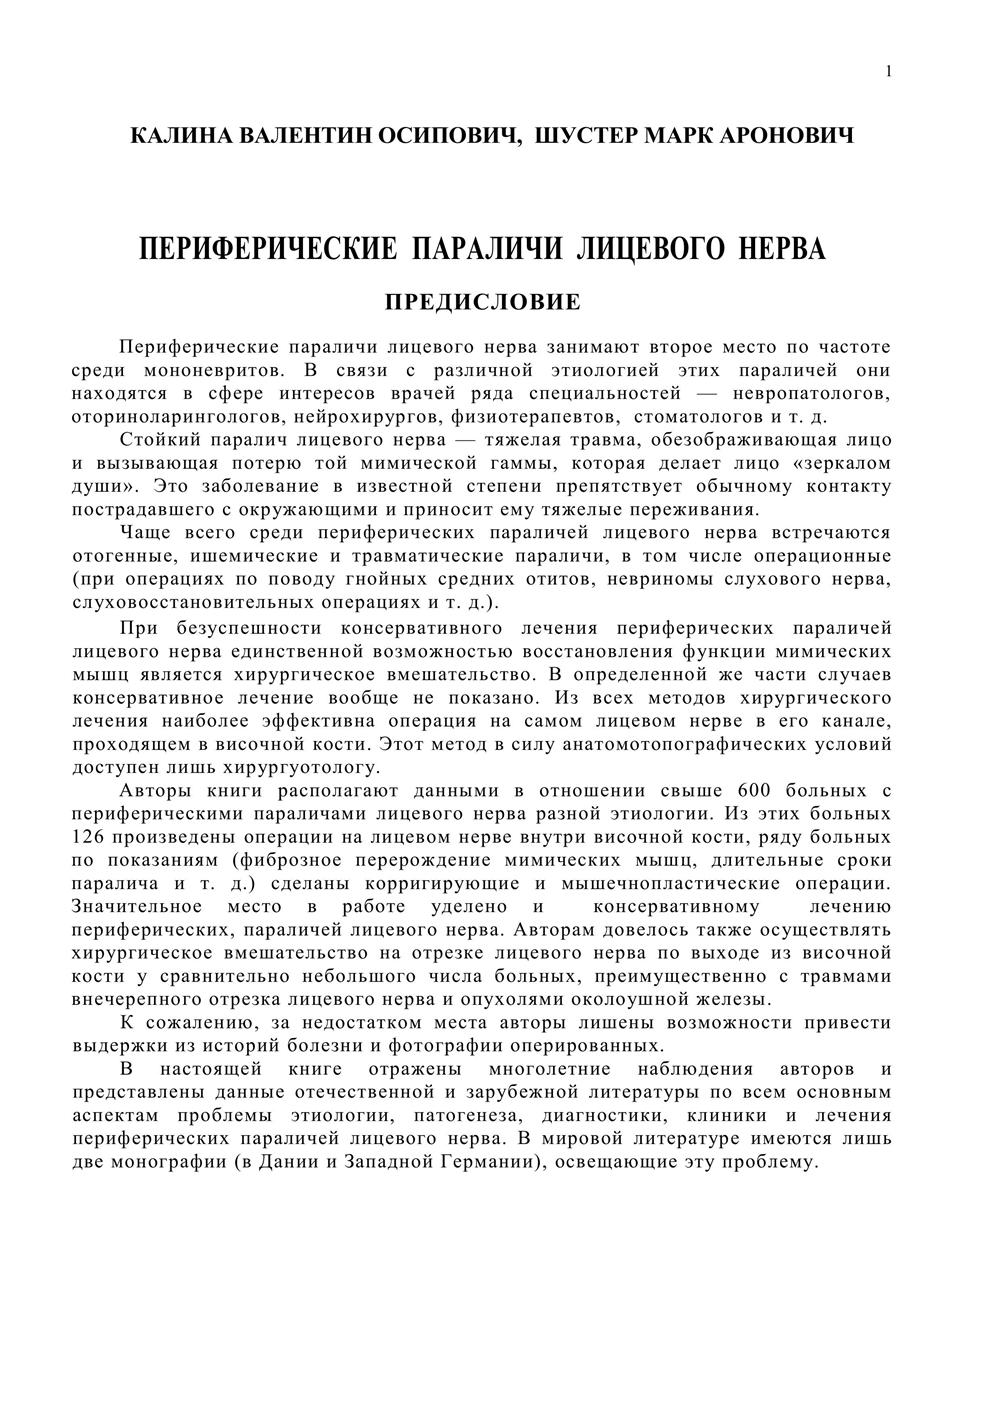 http://ipic.su/img/img7/fs/KalinaV.1591428764.jpg